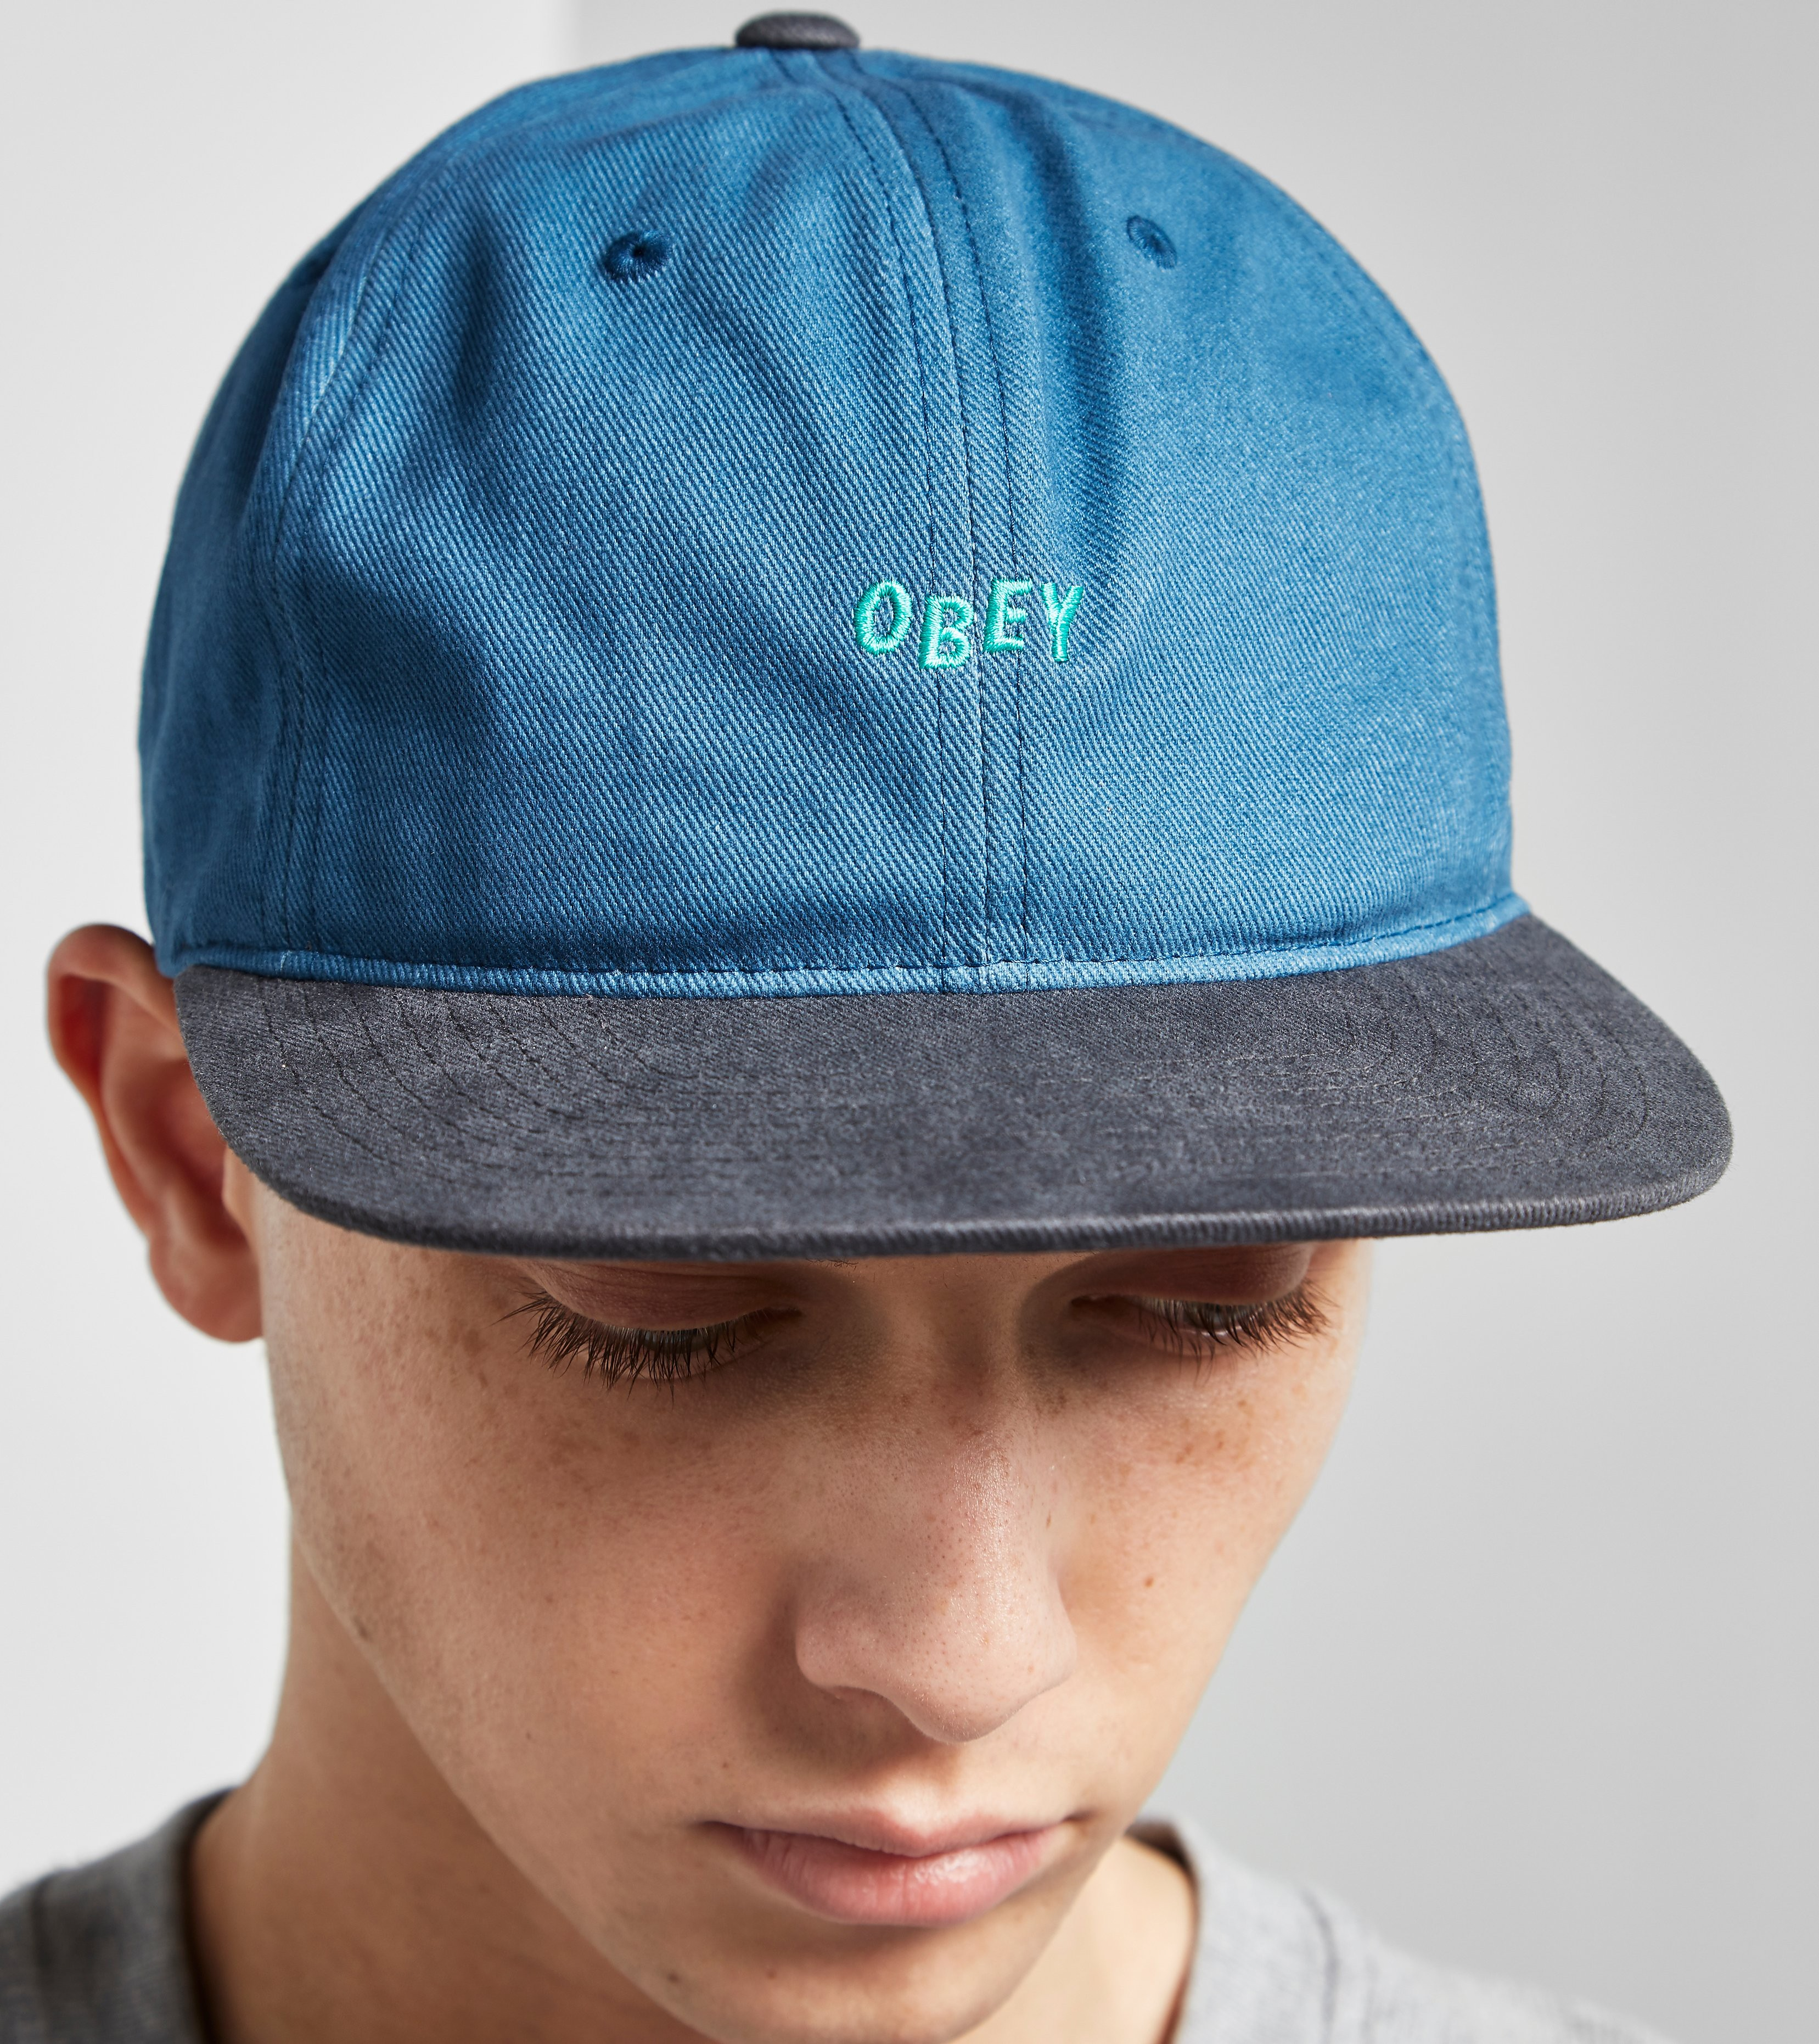 Obey '90s Two Tone Strapback Cap